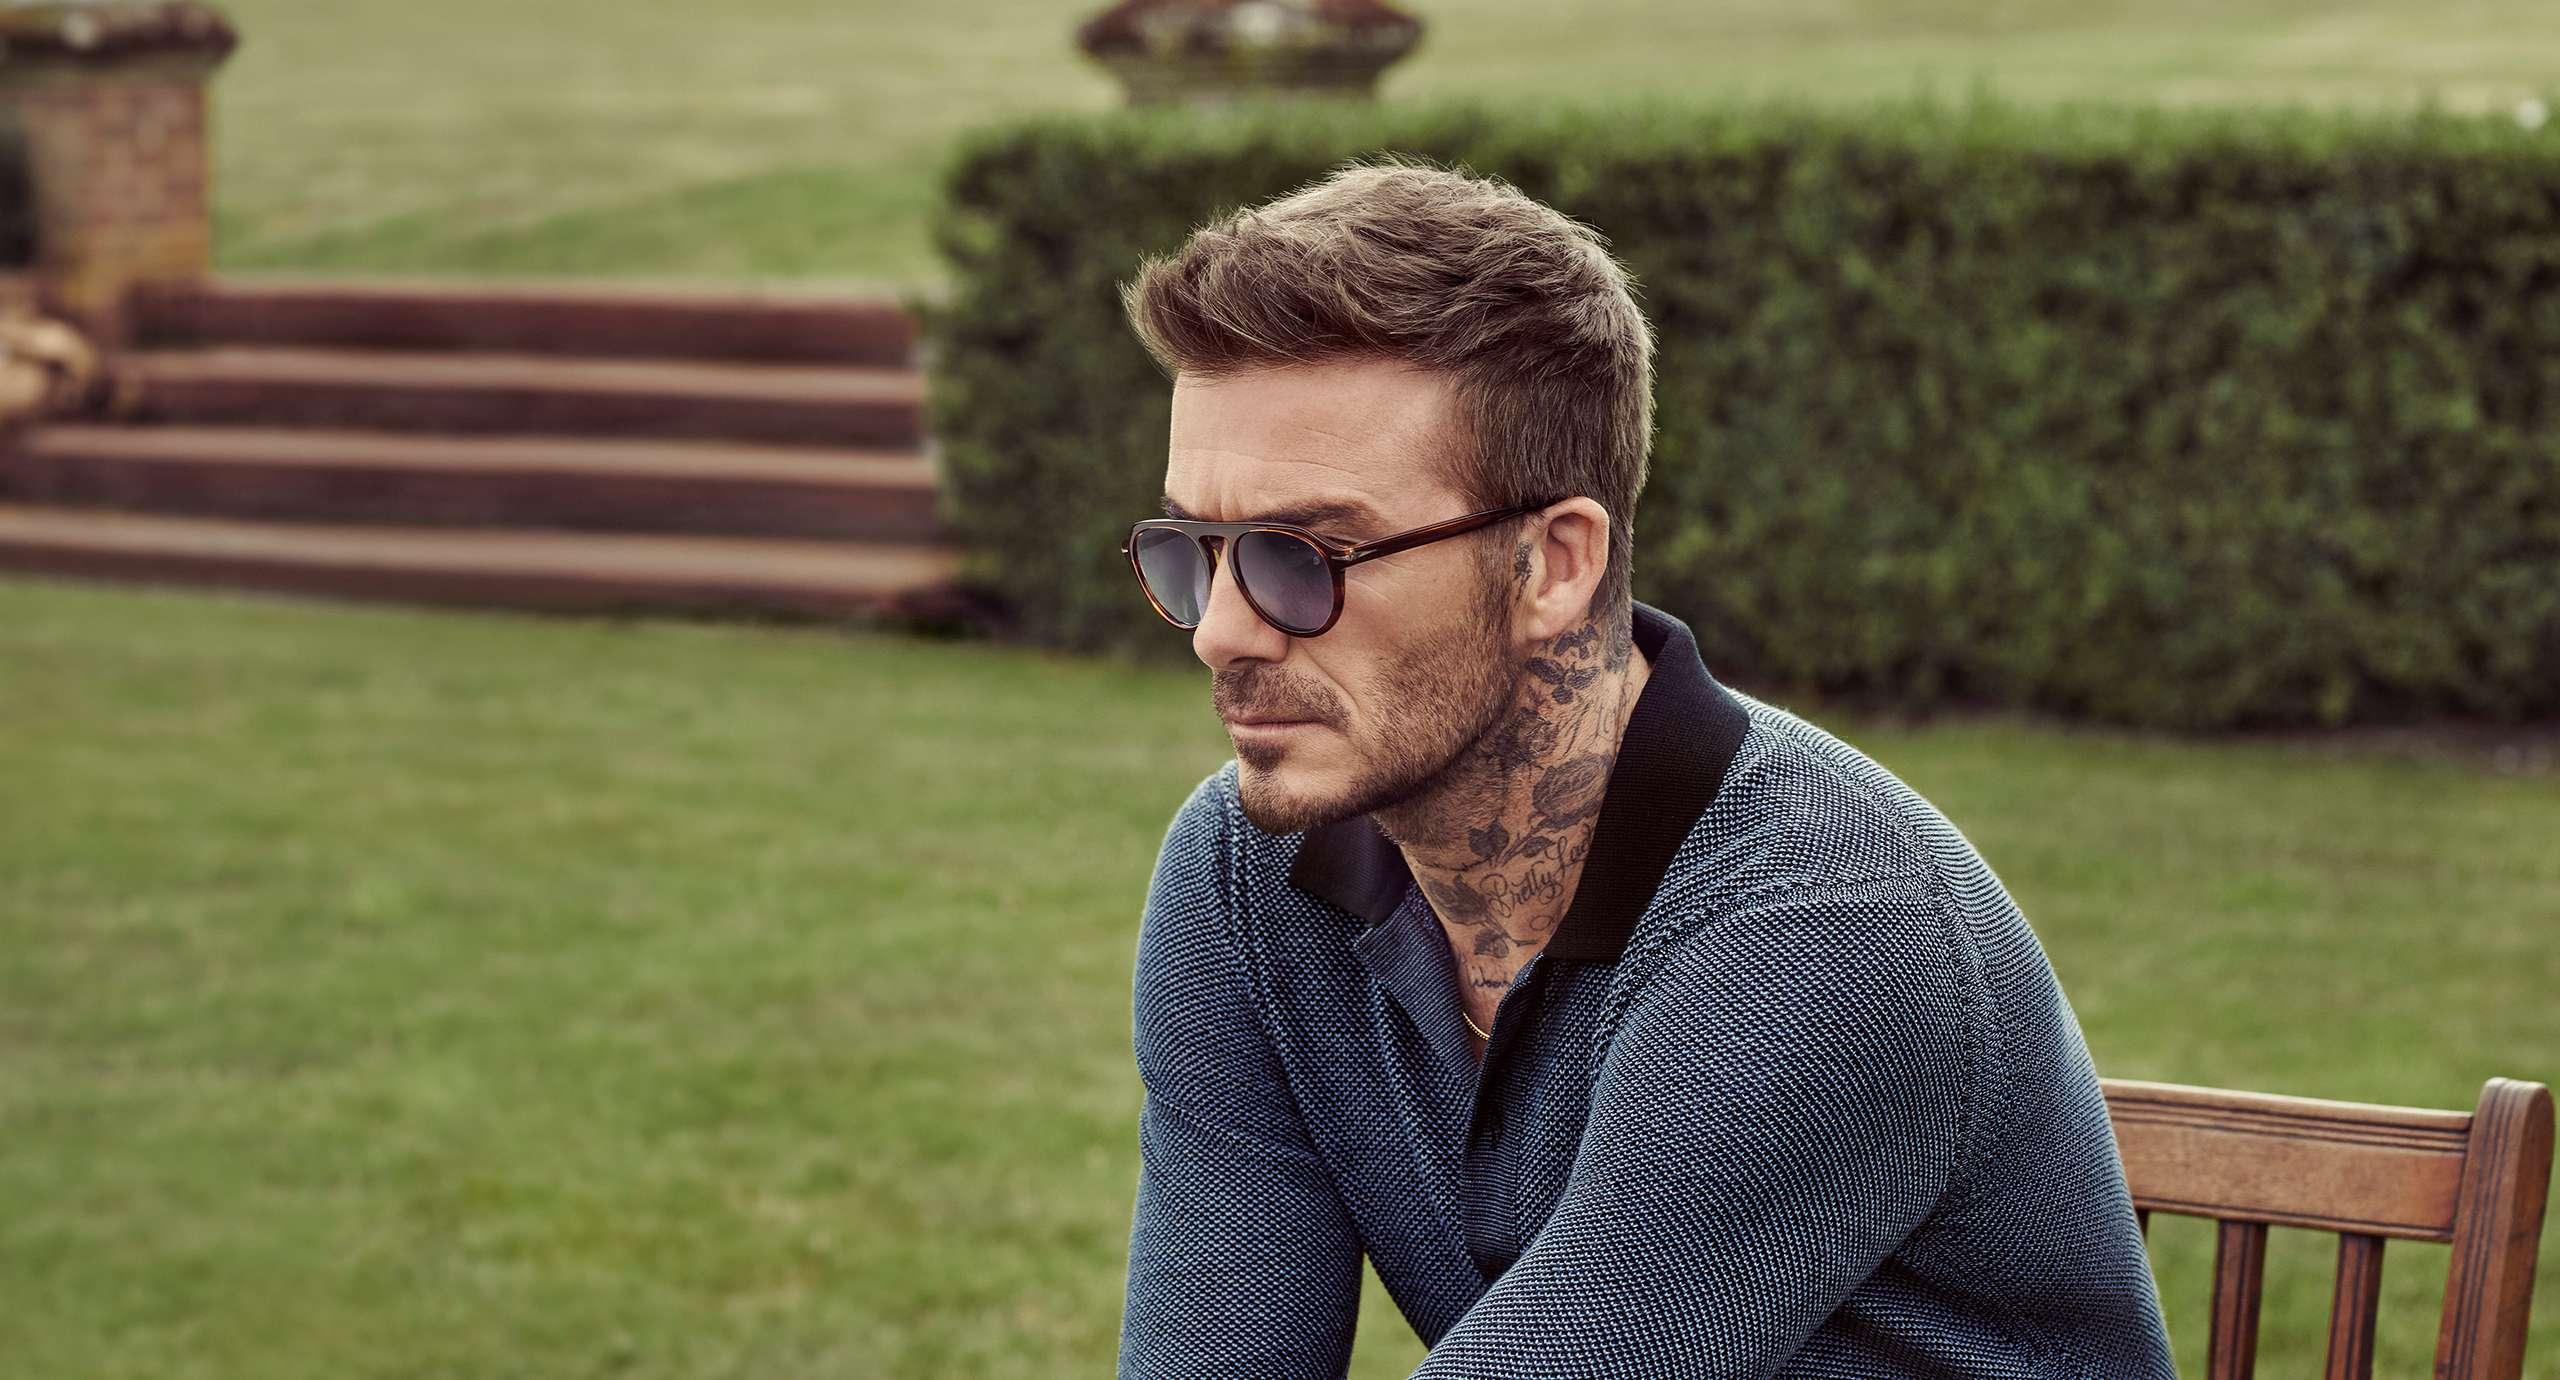 Eyewear by<br>David Beckham